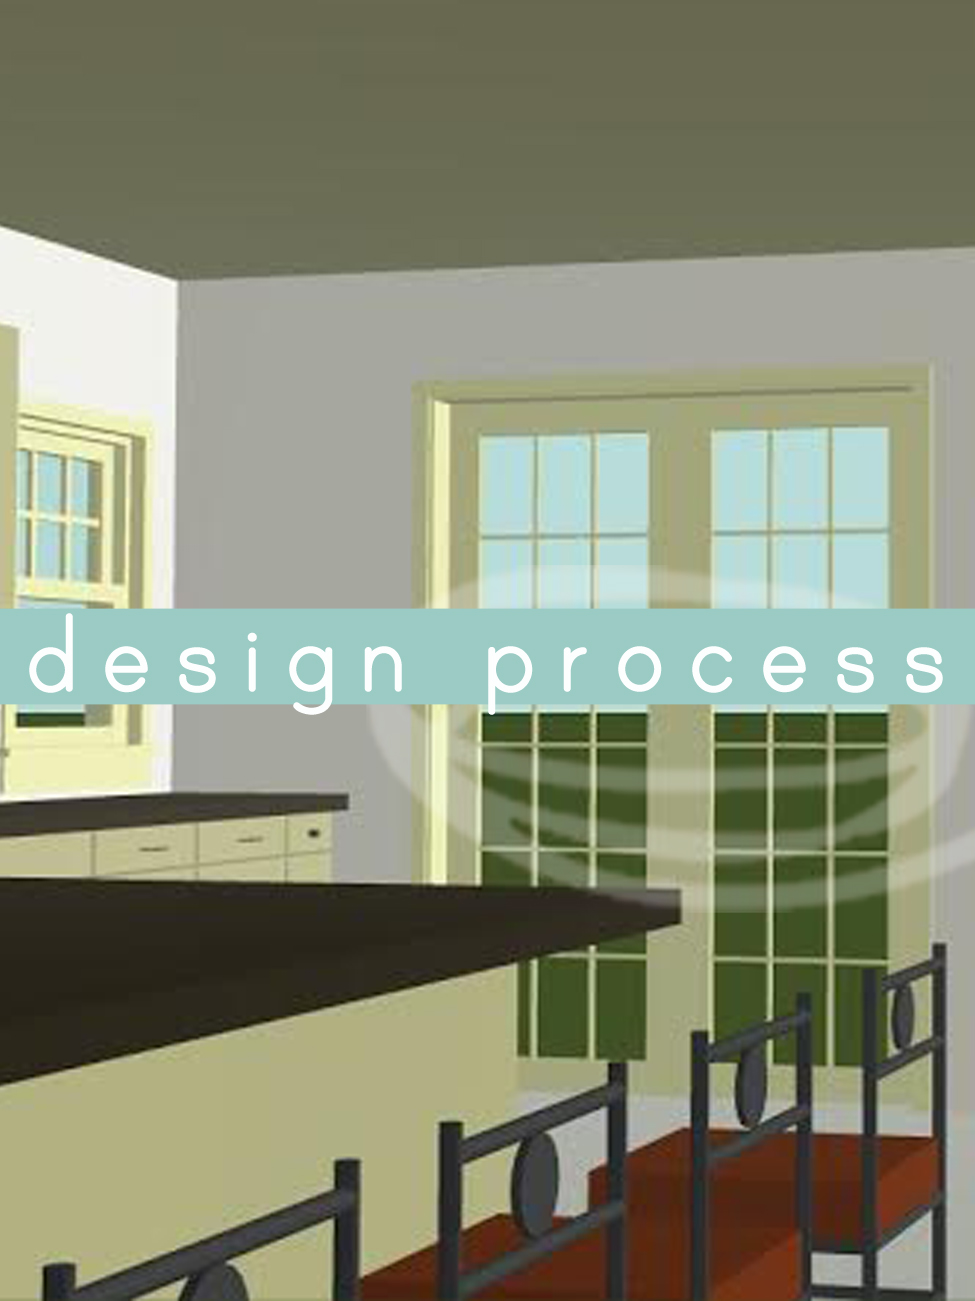 designprocess98.jpg